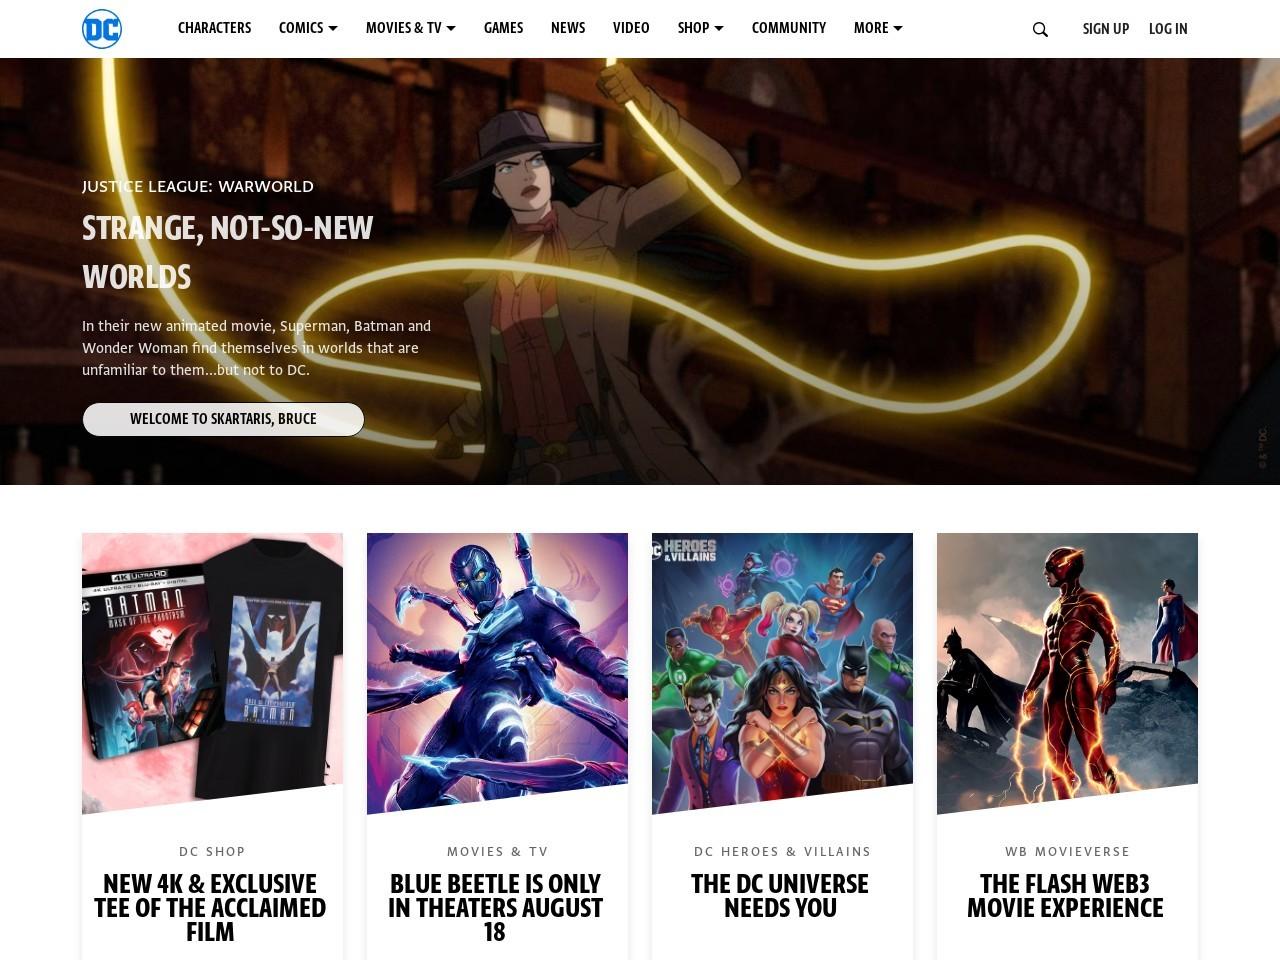 http://www.dccomics.com/blog/2017/04/07/dc-kids-super-hero-month-sweepstakes